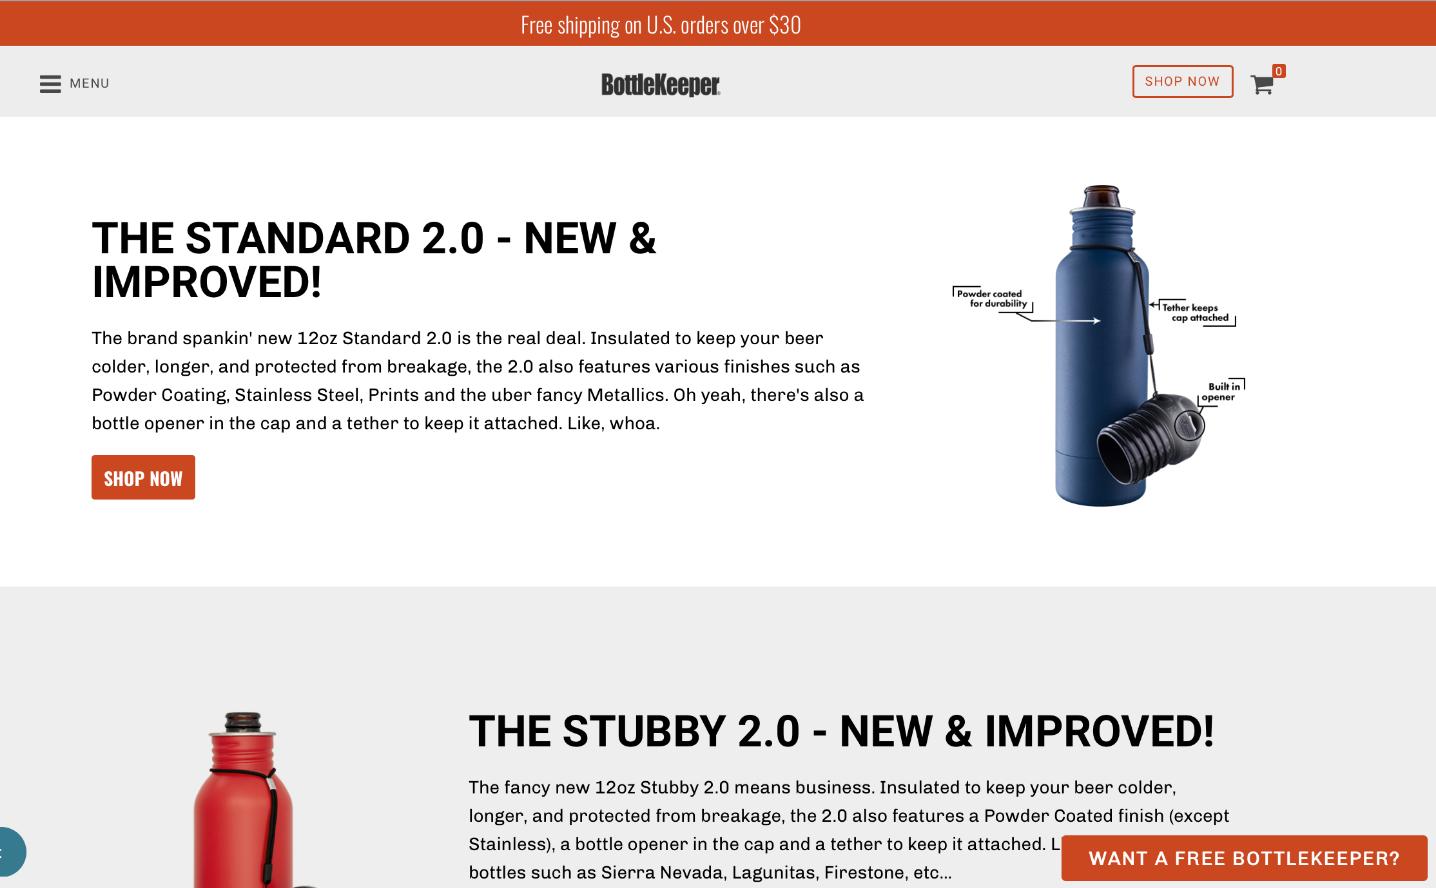 Screenshot of Growth Spark-designed Shopify site for BottleKeeper